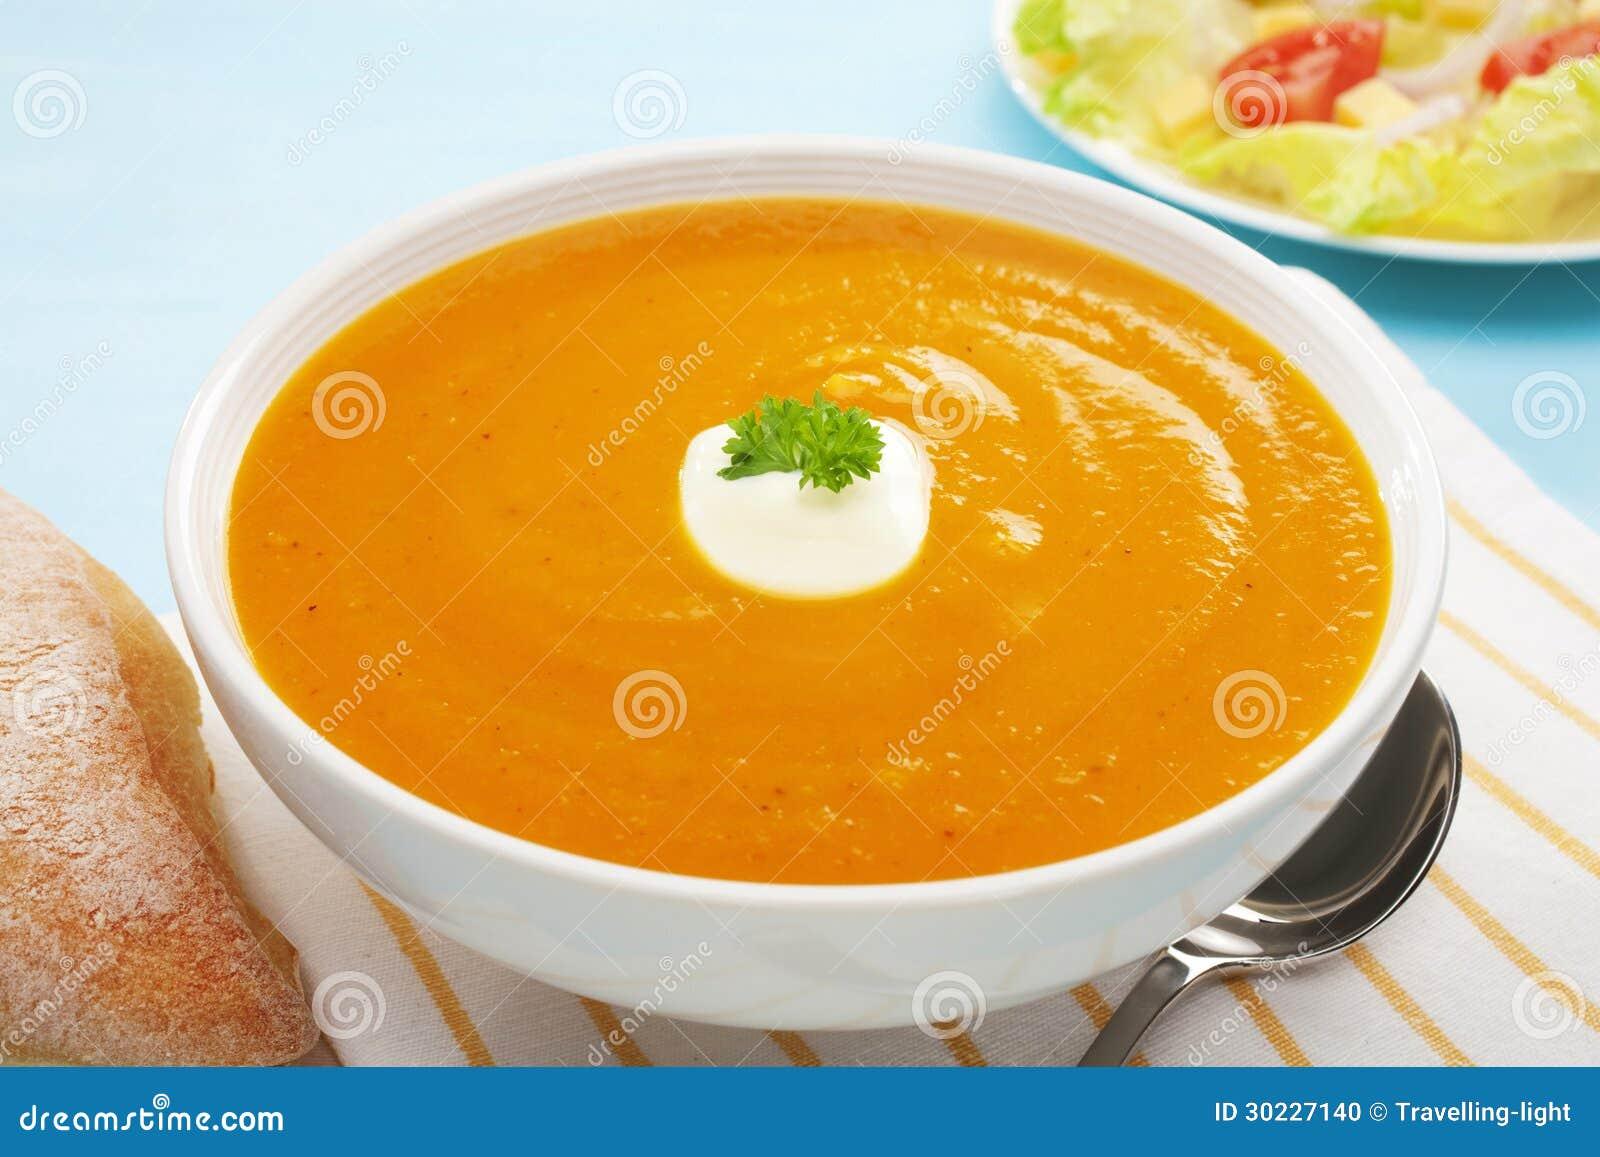 Pumpkin Soup Sweet Potato Carrot Salad Bread Copy Space